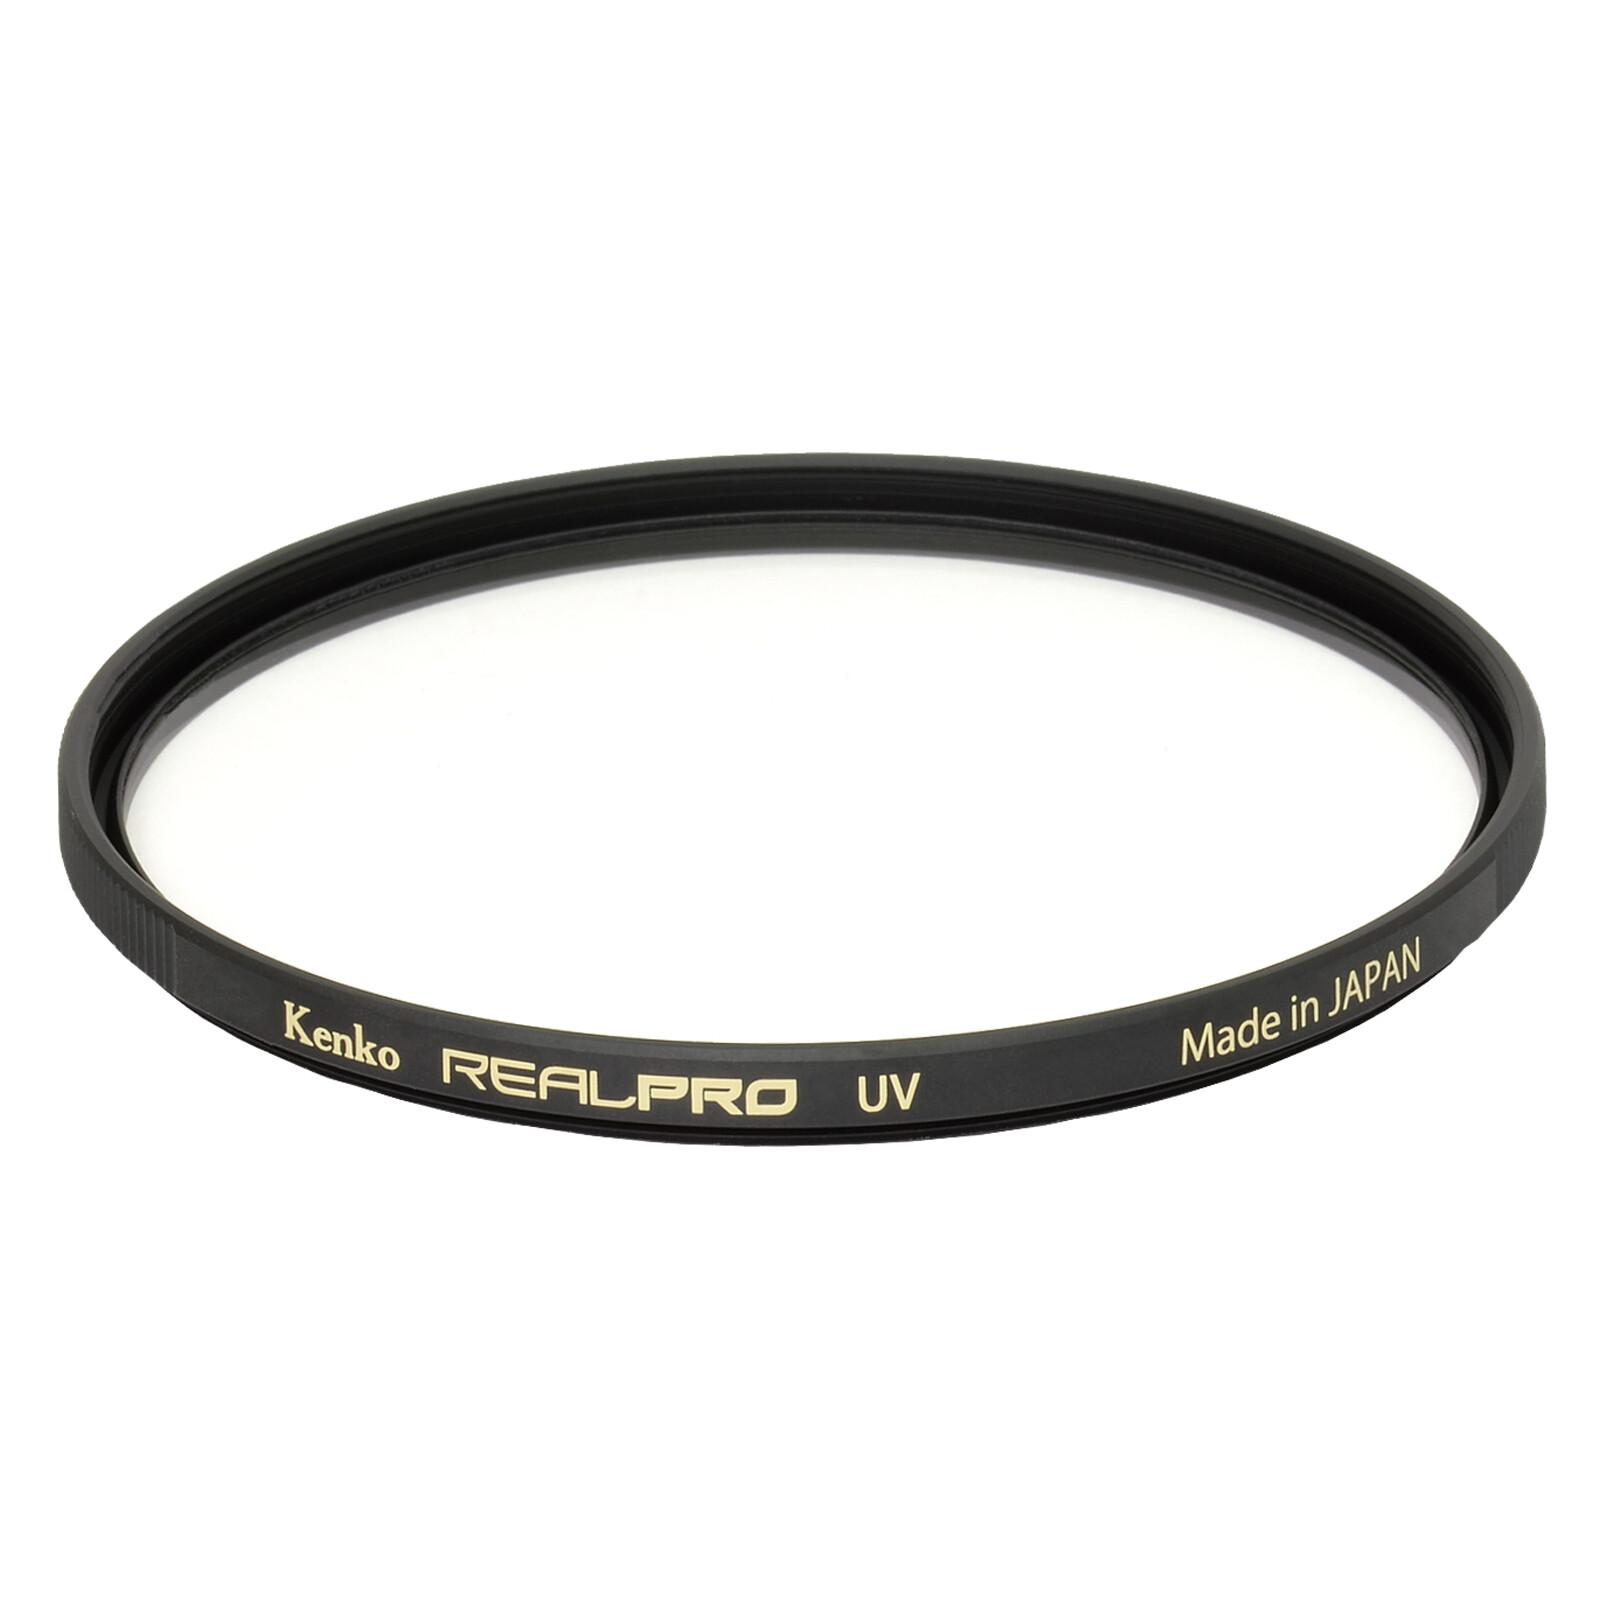 Kenko Real Pro UV 52mm Slim